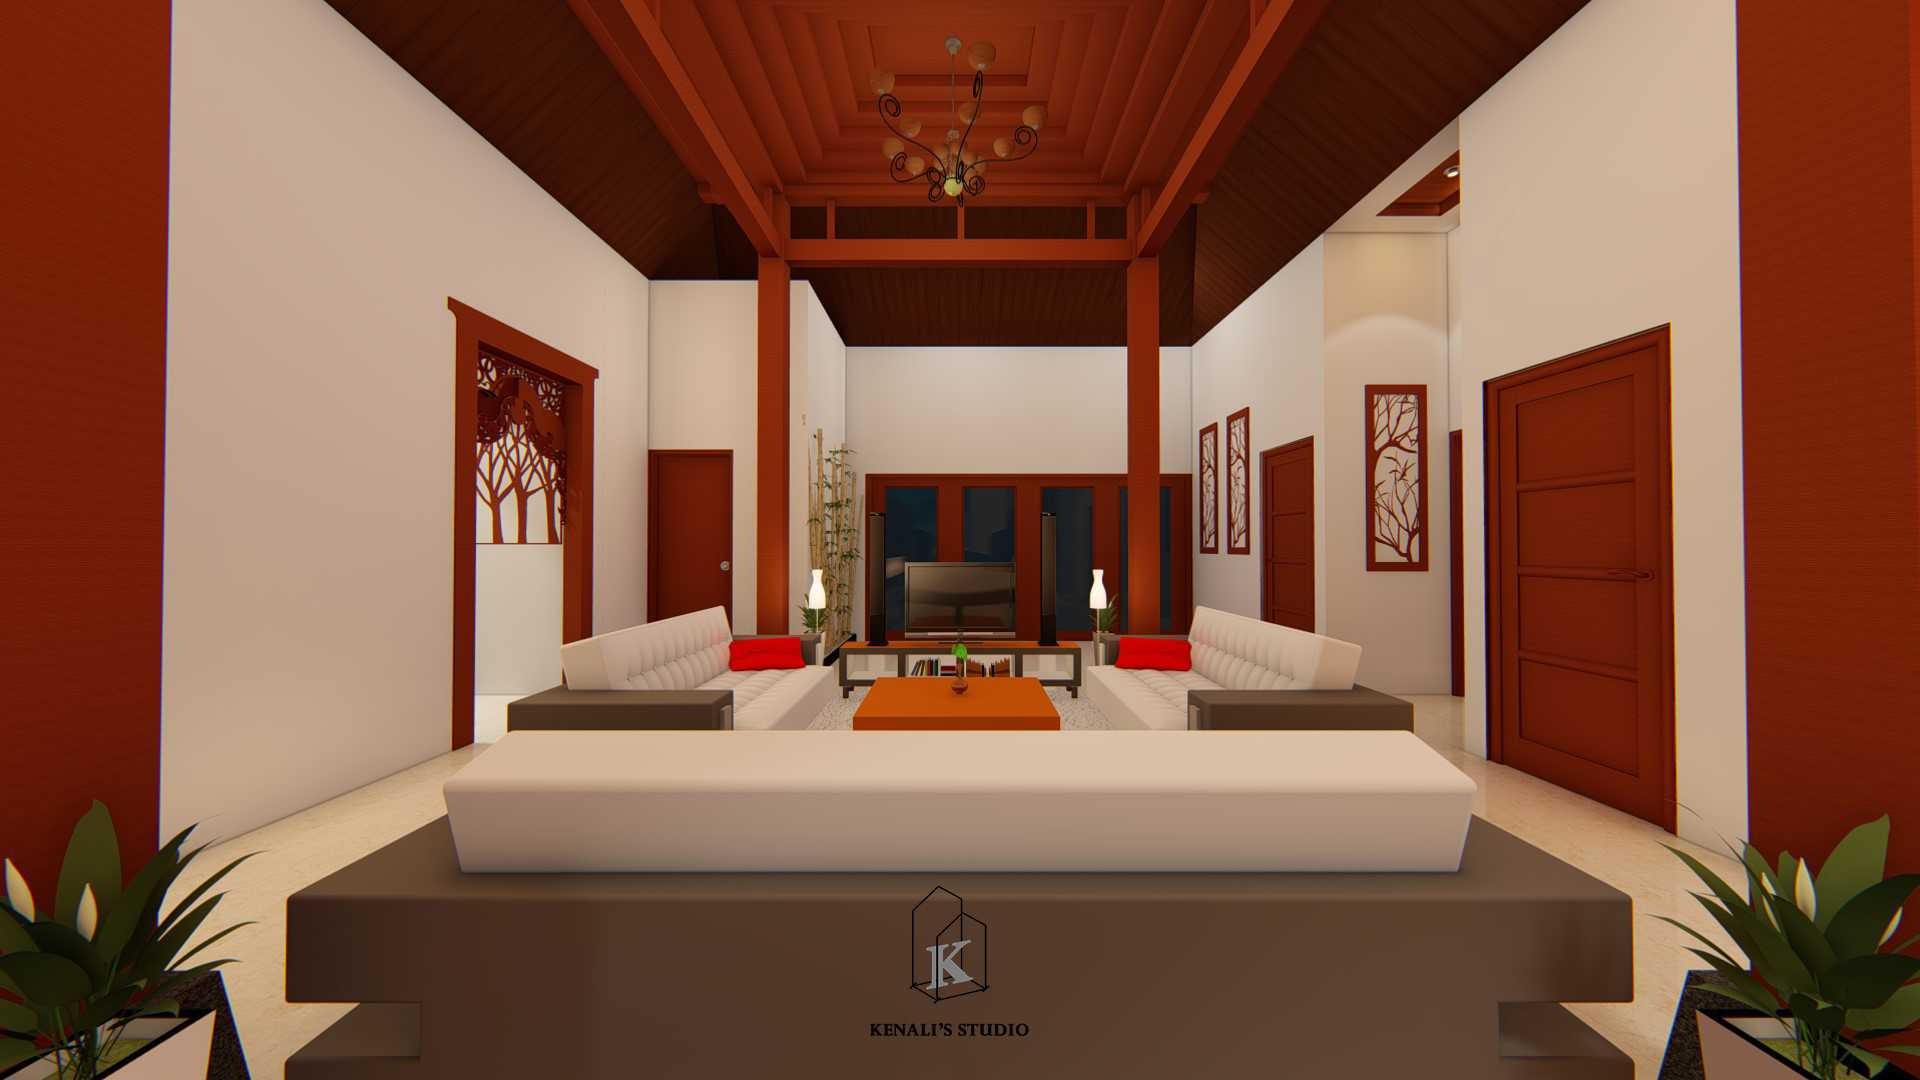 "Kenali's Studio ""chronicles Of Joglo"" A - House Salatiga, Kota Salatiga, Jawa Tengah, Indonesia Salatiga, Kota Salatiga, Jawa Tengah, Indonesia Kenalis-Studio-Chronicles-Of-Joglo-A-House   66937"